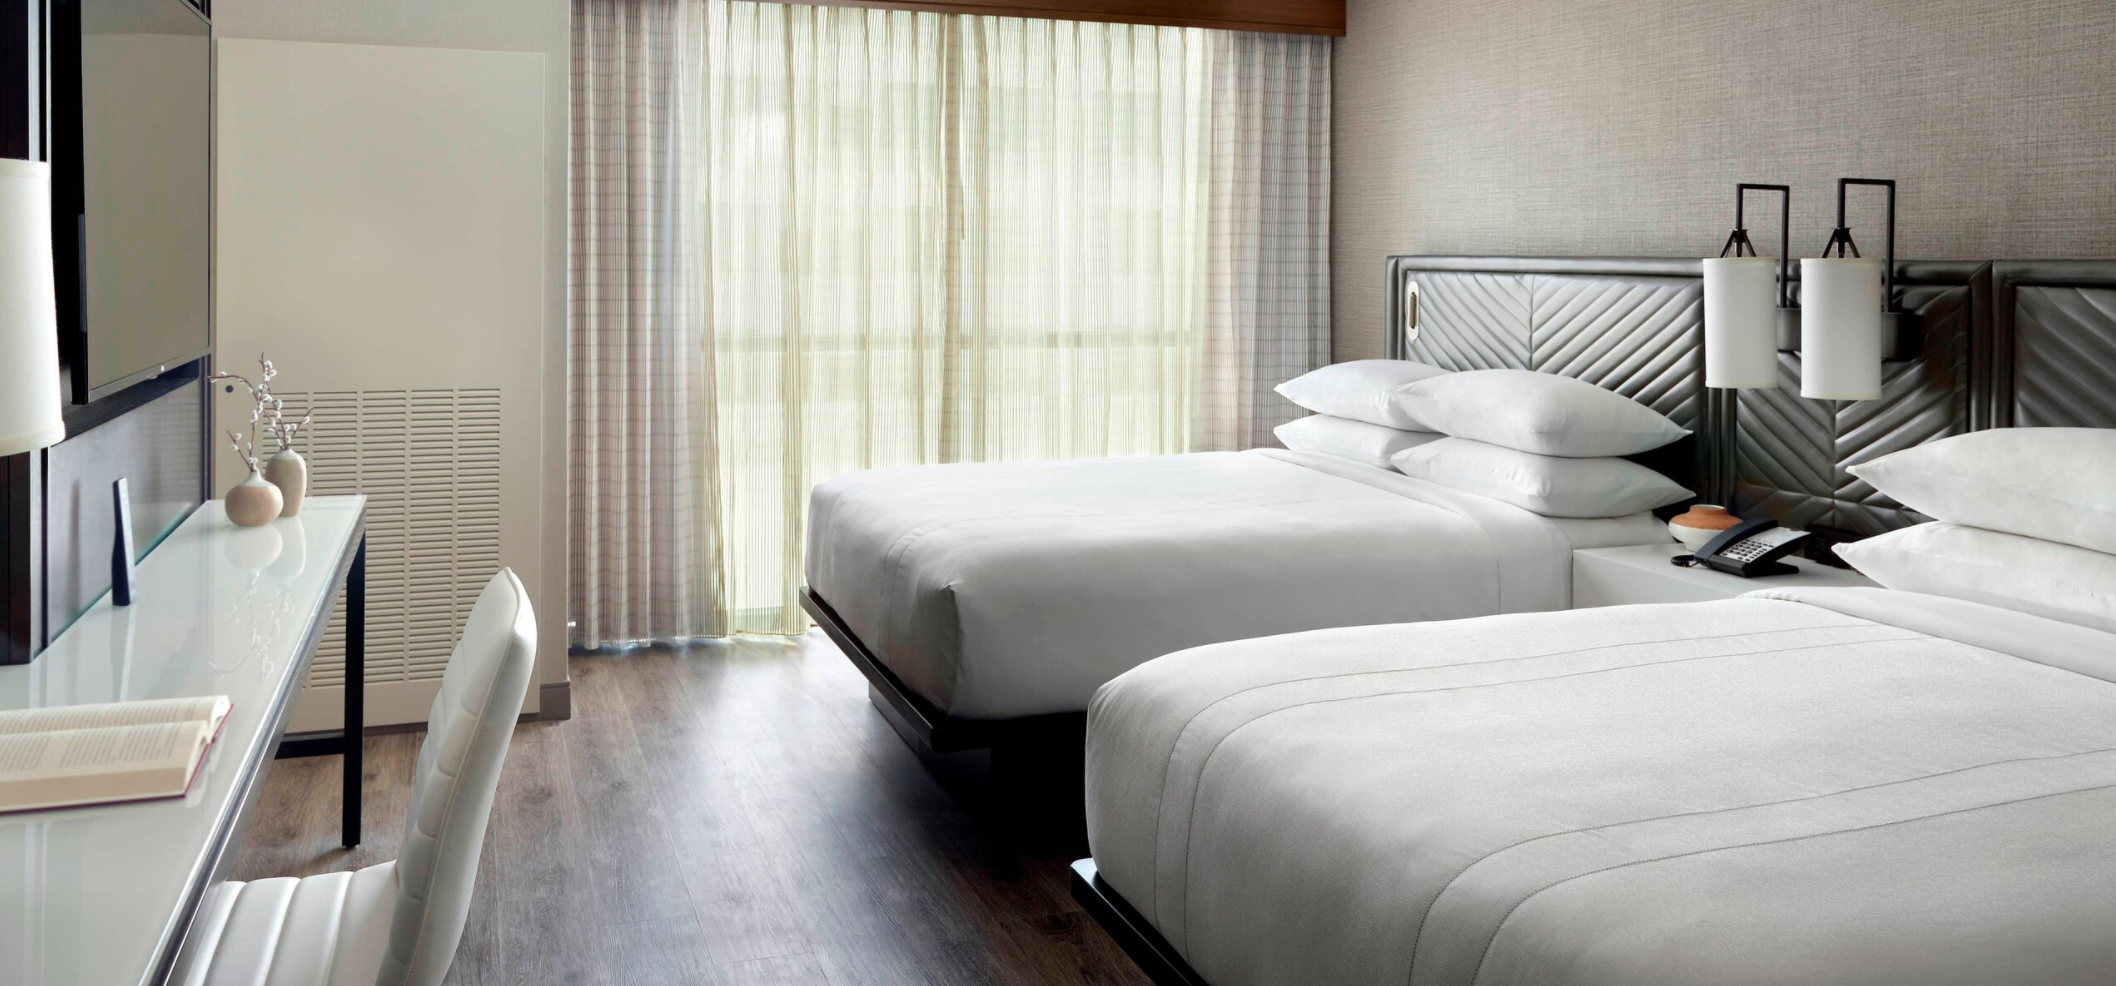 https://www.hotelsbyday.com/_data/default-hotel_image/3/18510/screenshot-2020-06-12-at-5-10-28-pm.png